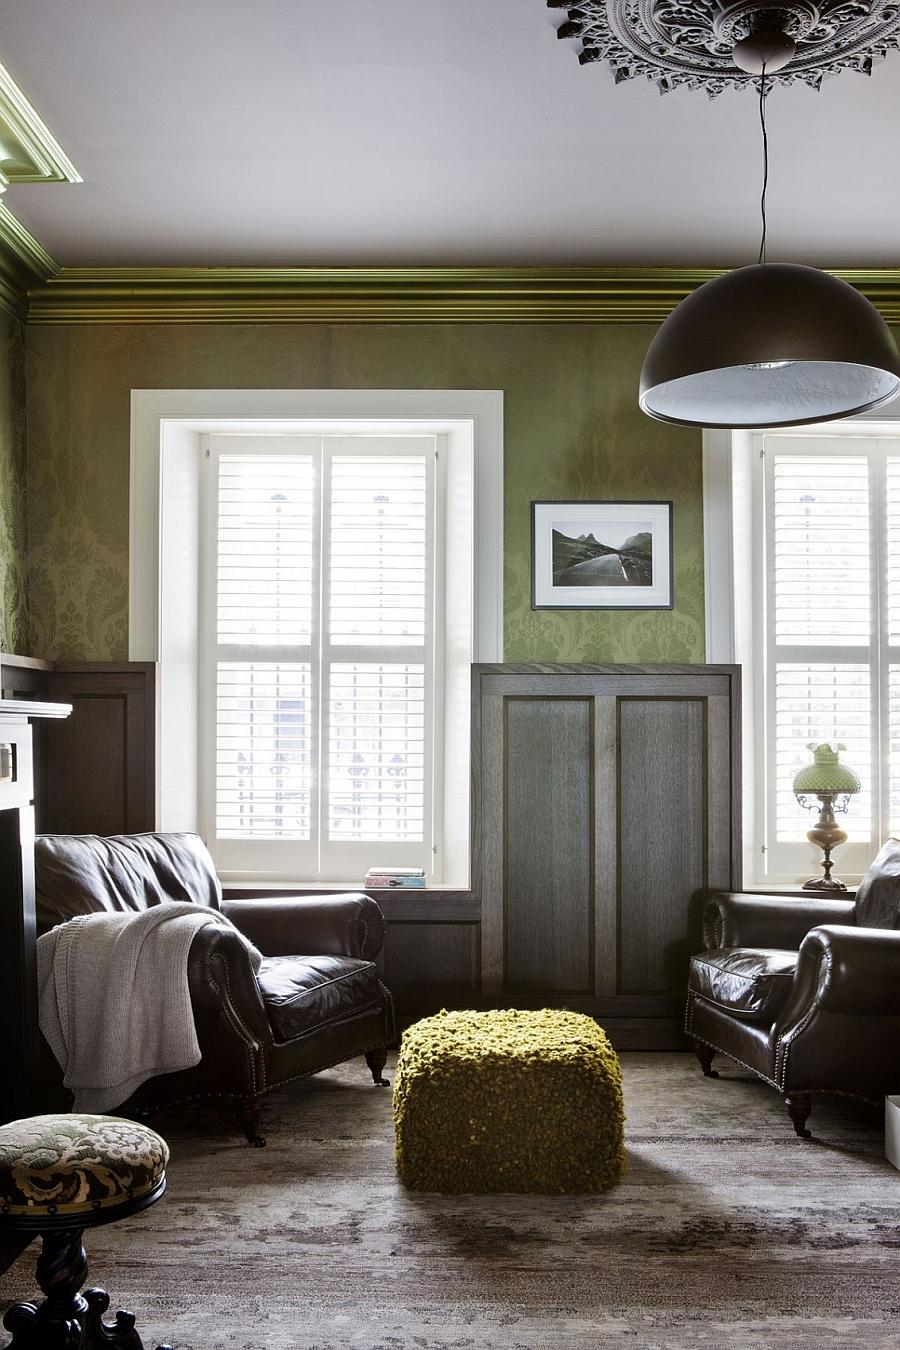 Cozy room with plush decor